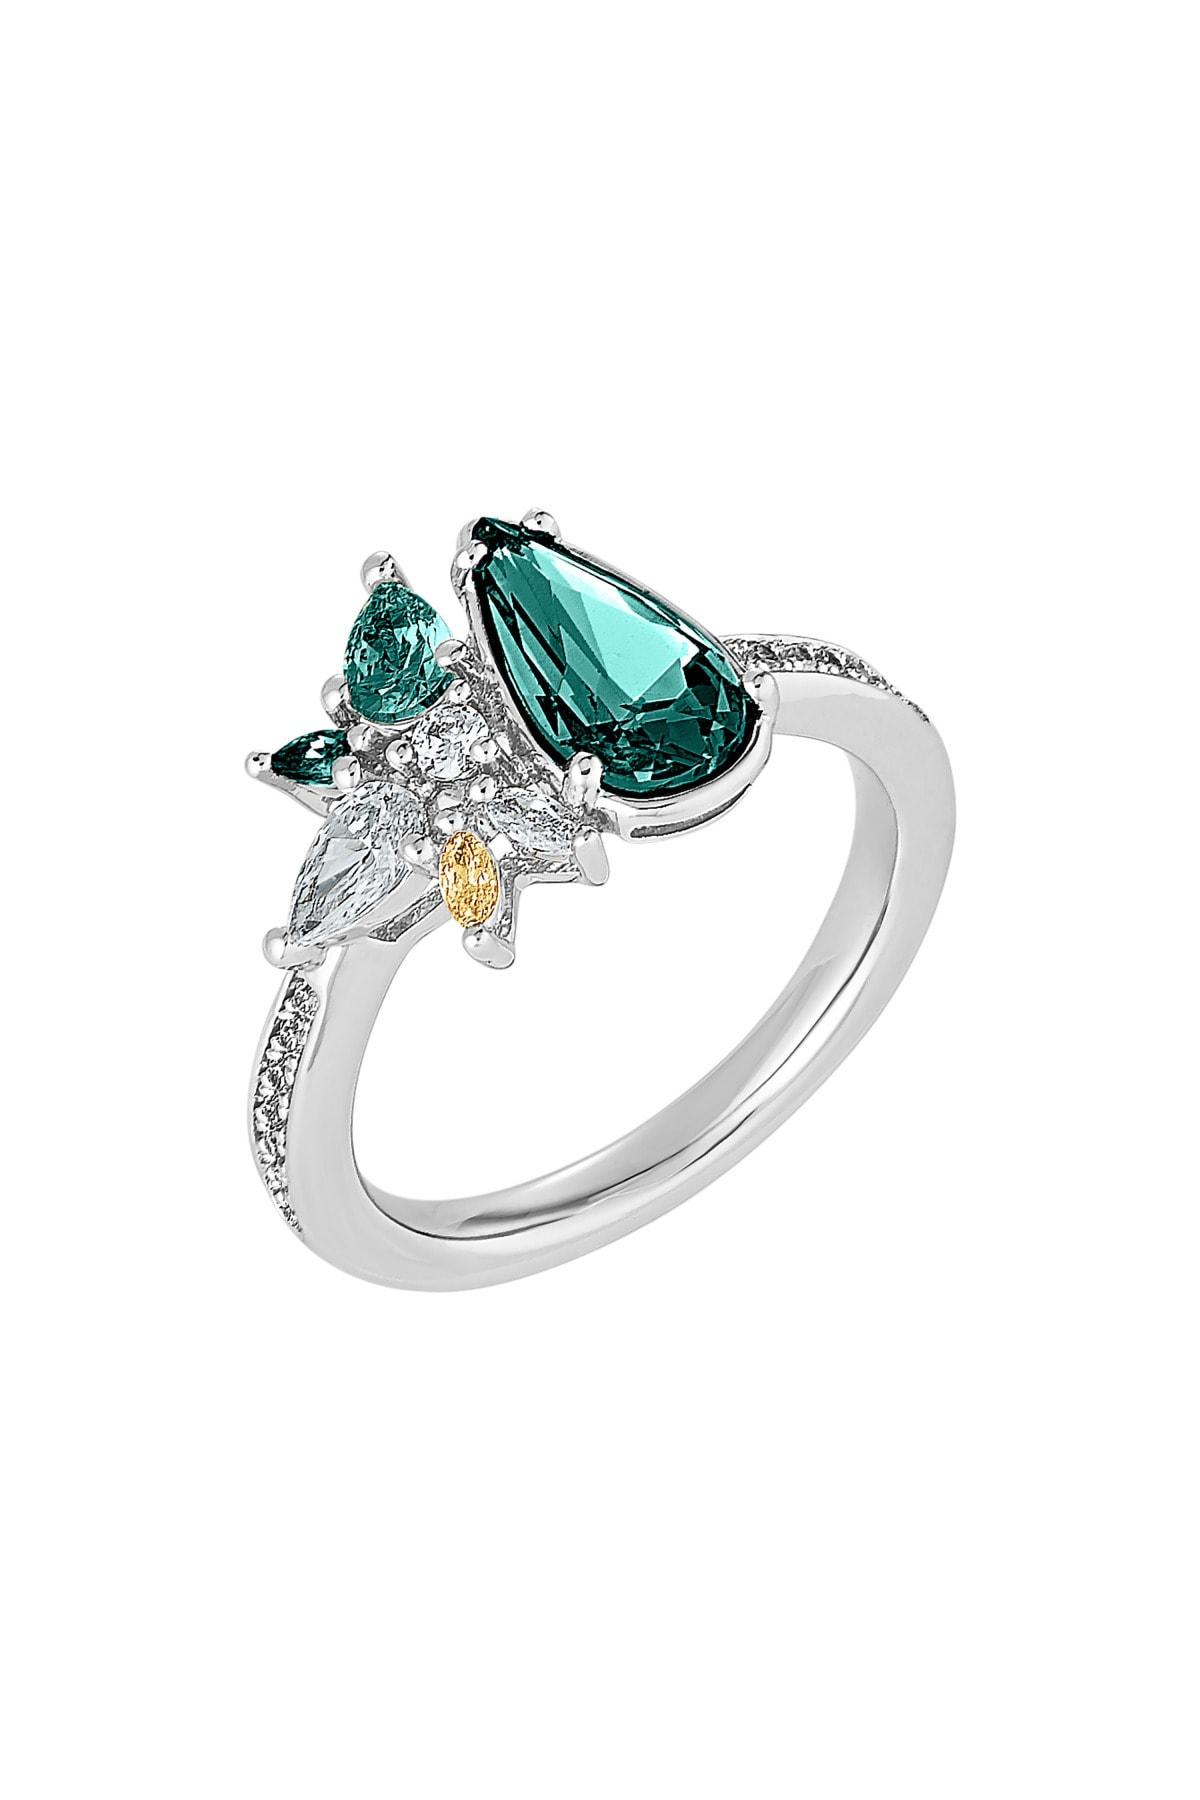 Swarovski Yüzük Botanical-ring Ring C Emrd-rhs 55 5535820 1